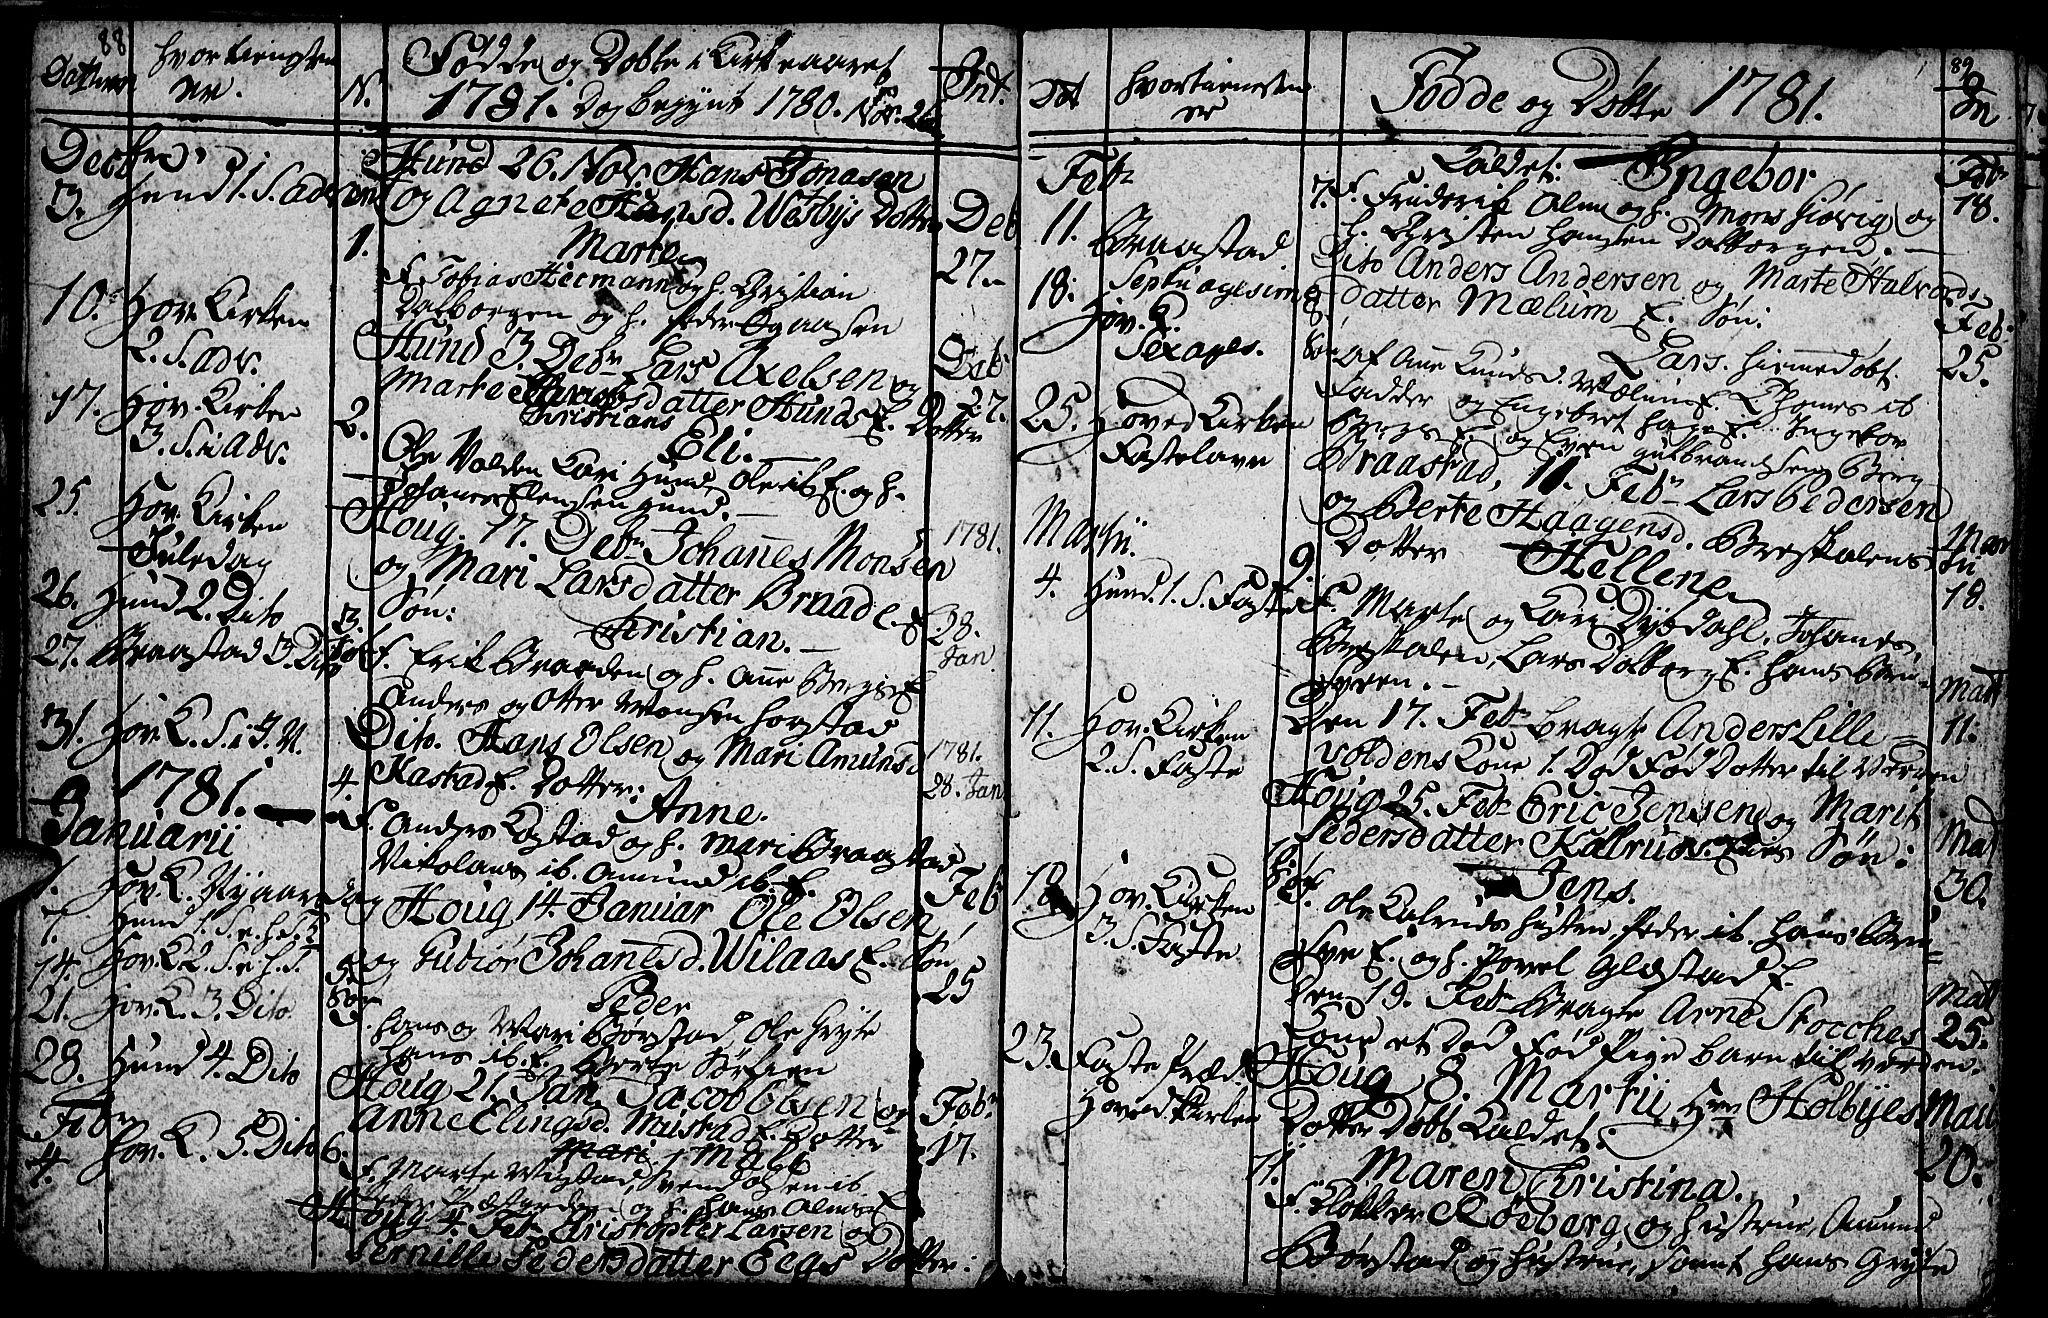 SAH, Vardal prestekontor, H/Ha/Hab/L0001: Klokkerbok nr. 1, 1771-1790, s. 88-89